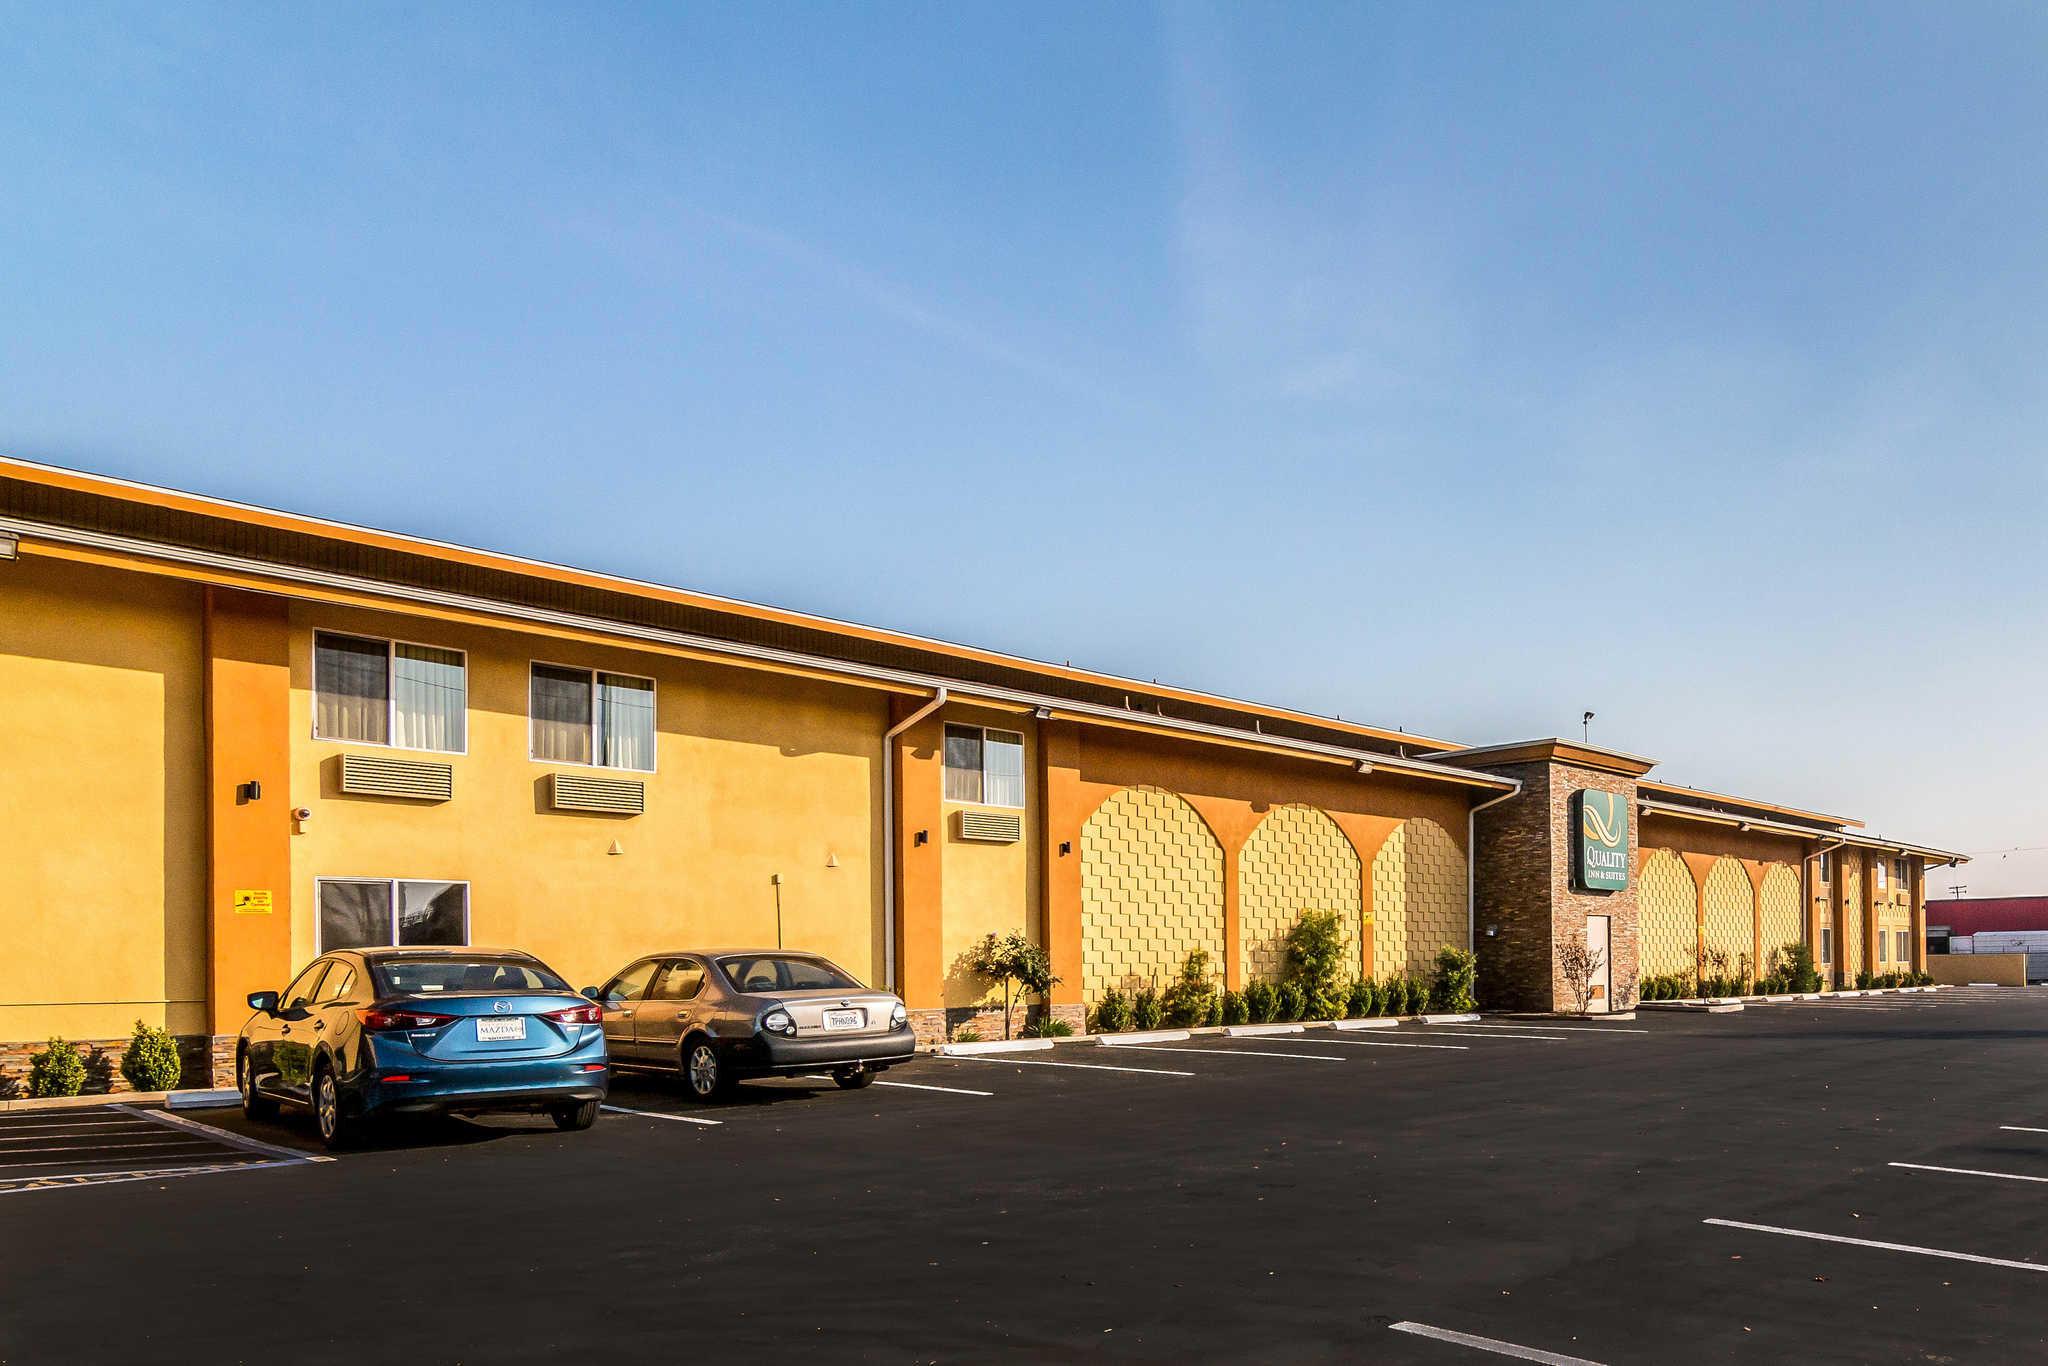 Hotel Suites In Bakersfield Ca